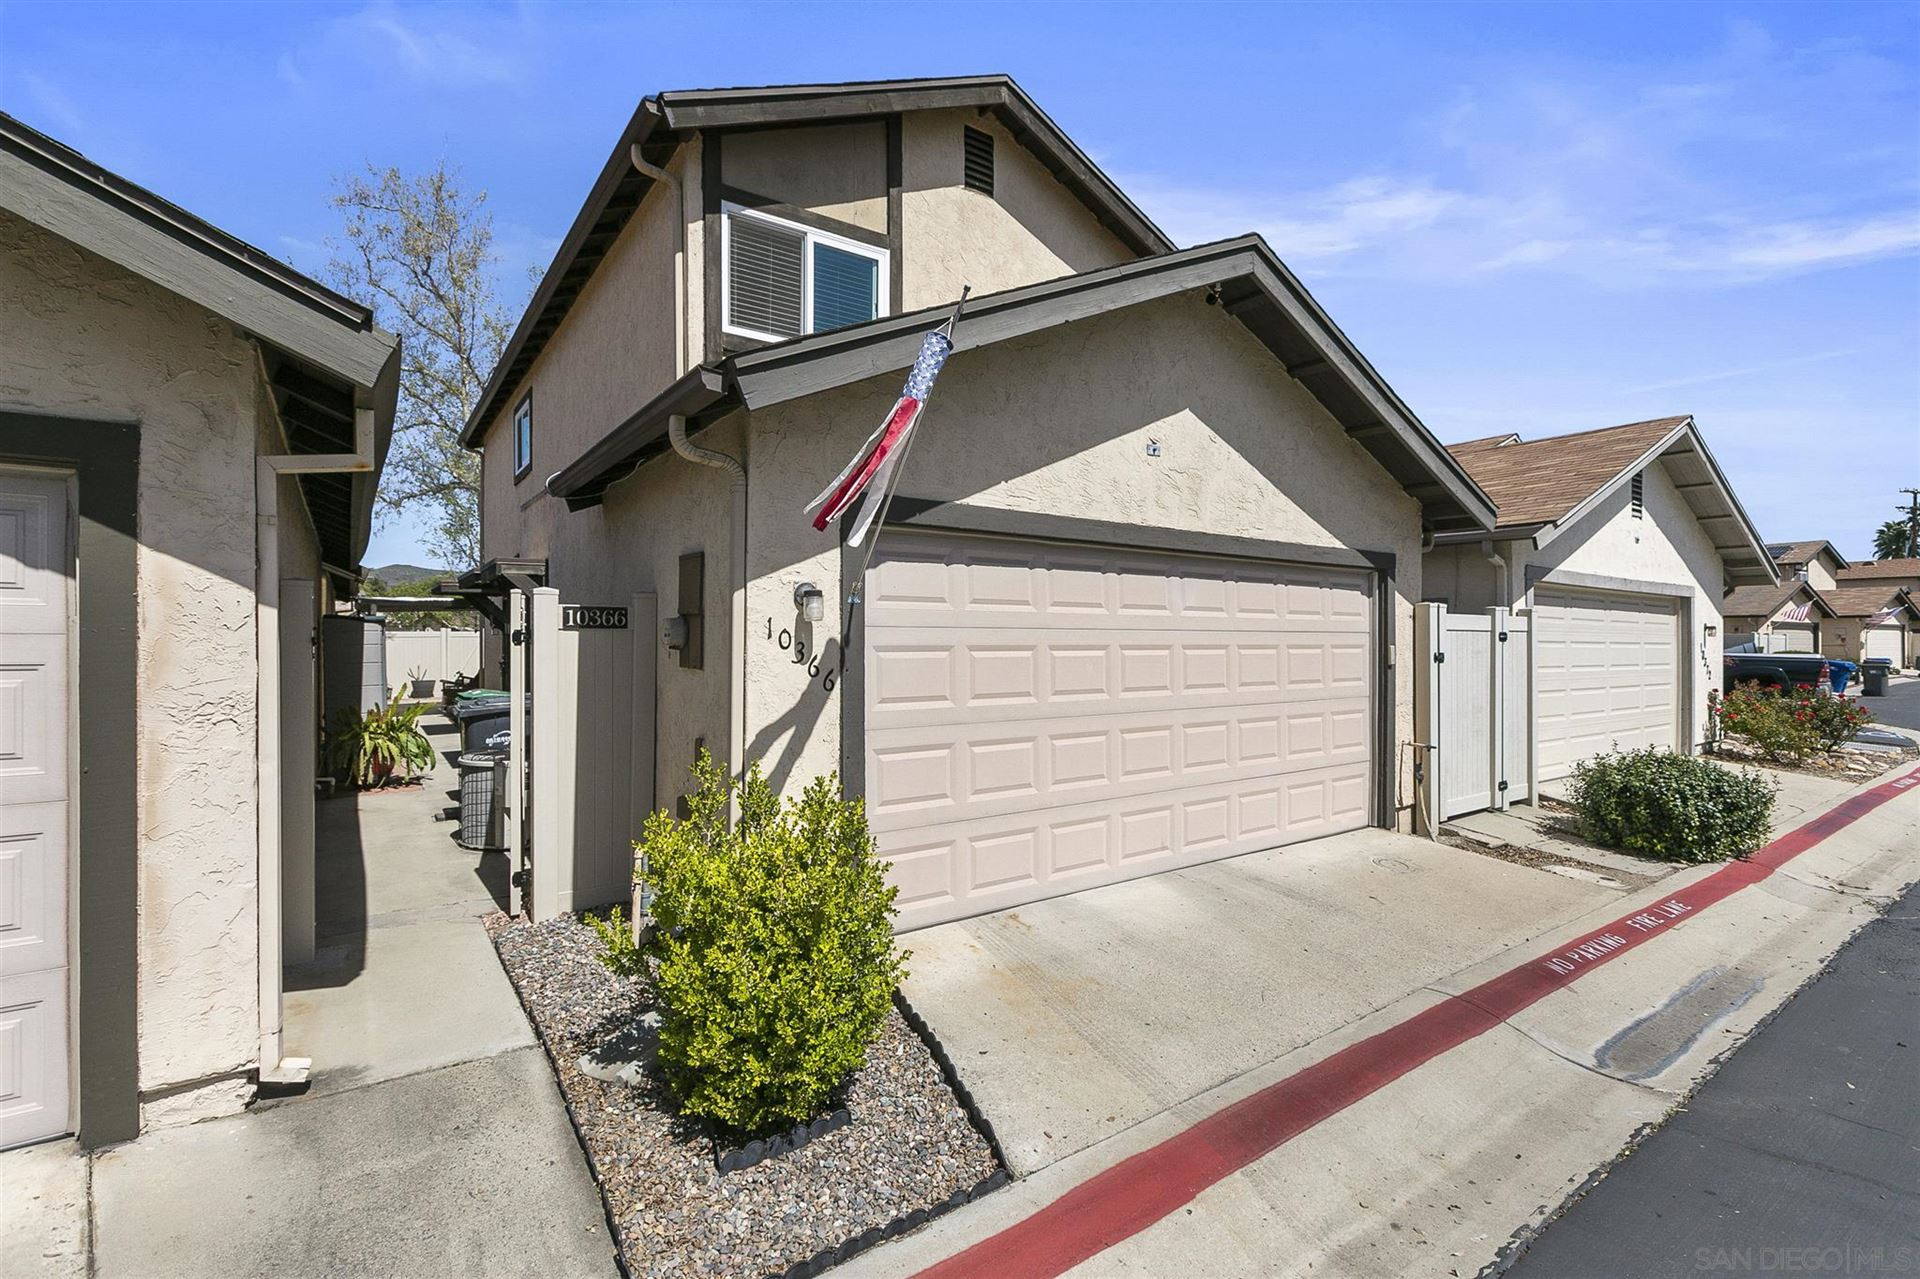 Photo of 10366 Rochelle Ave, Santee, CA 92071 (MLS # 210009066)